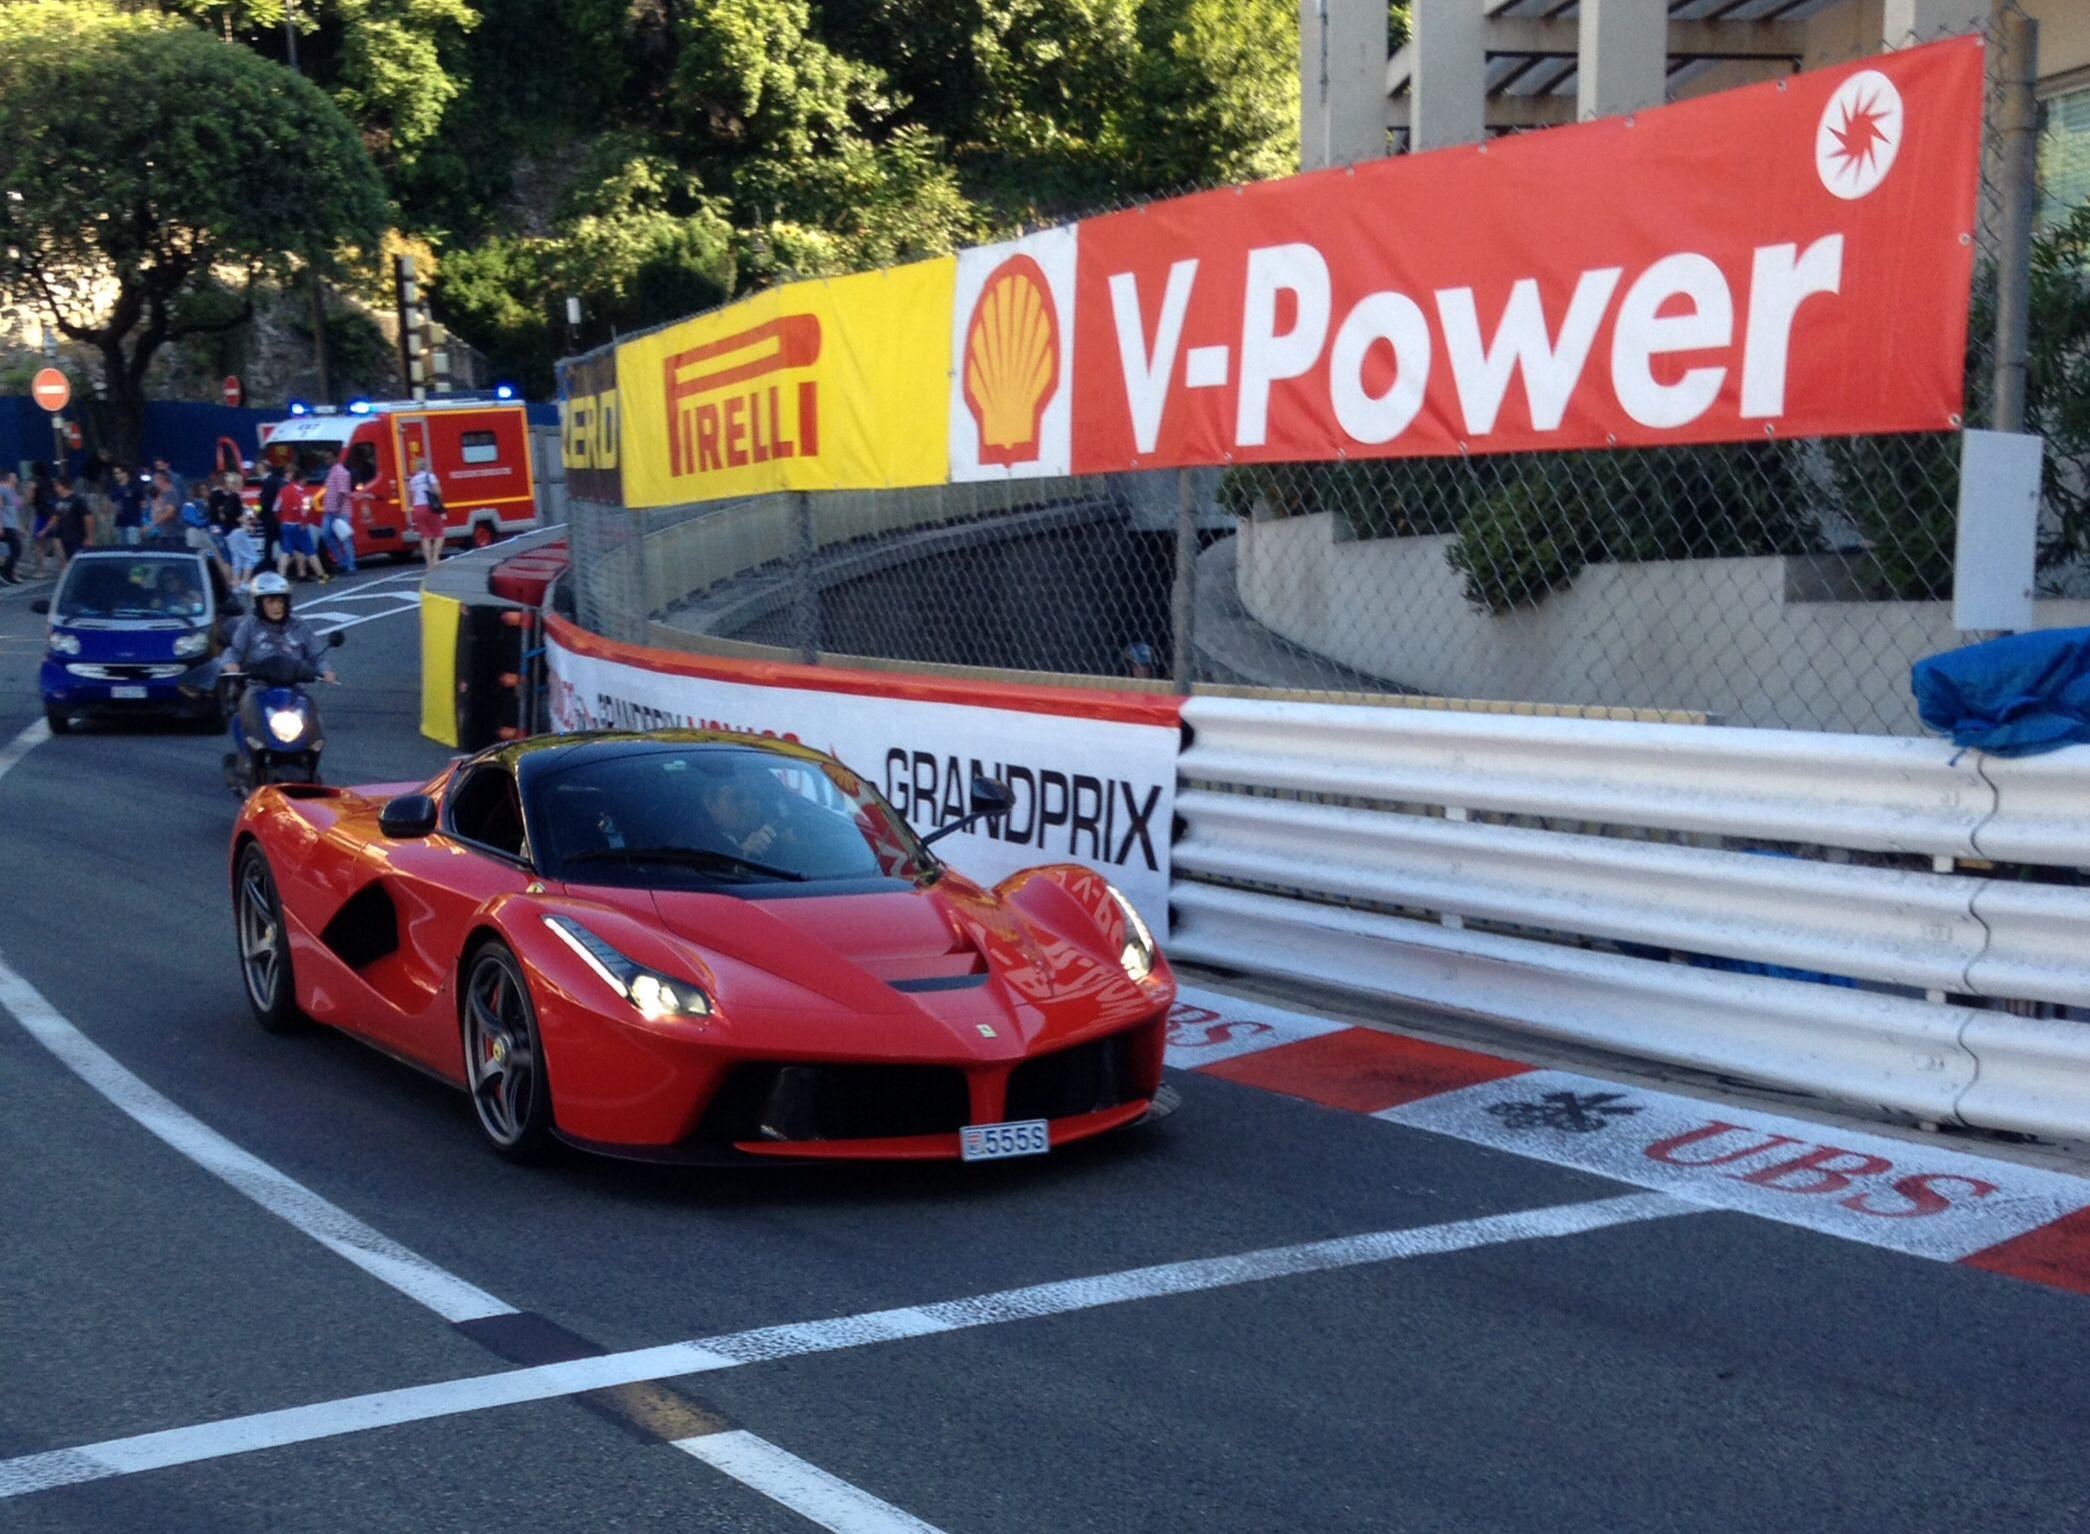 Luxury car toys  La Ferrari Monaco GP  Boys Toys  Pinterest  La ferrari and Ferrari